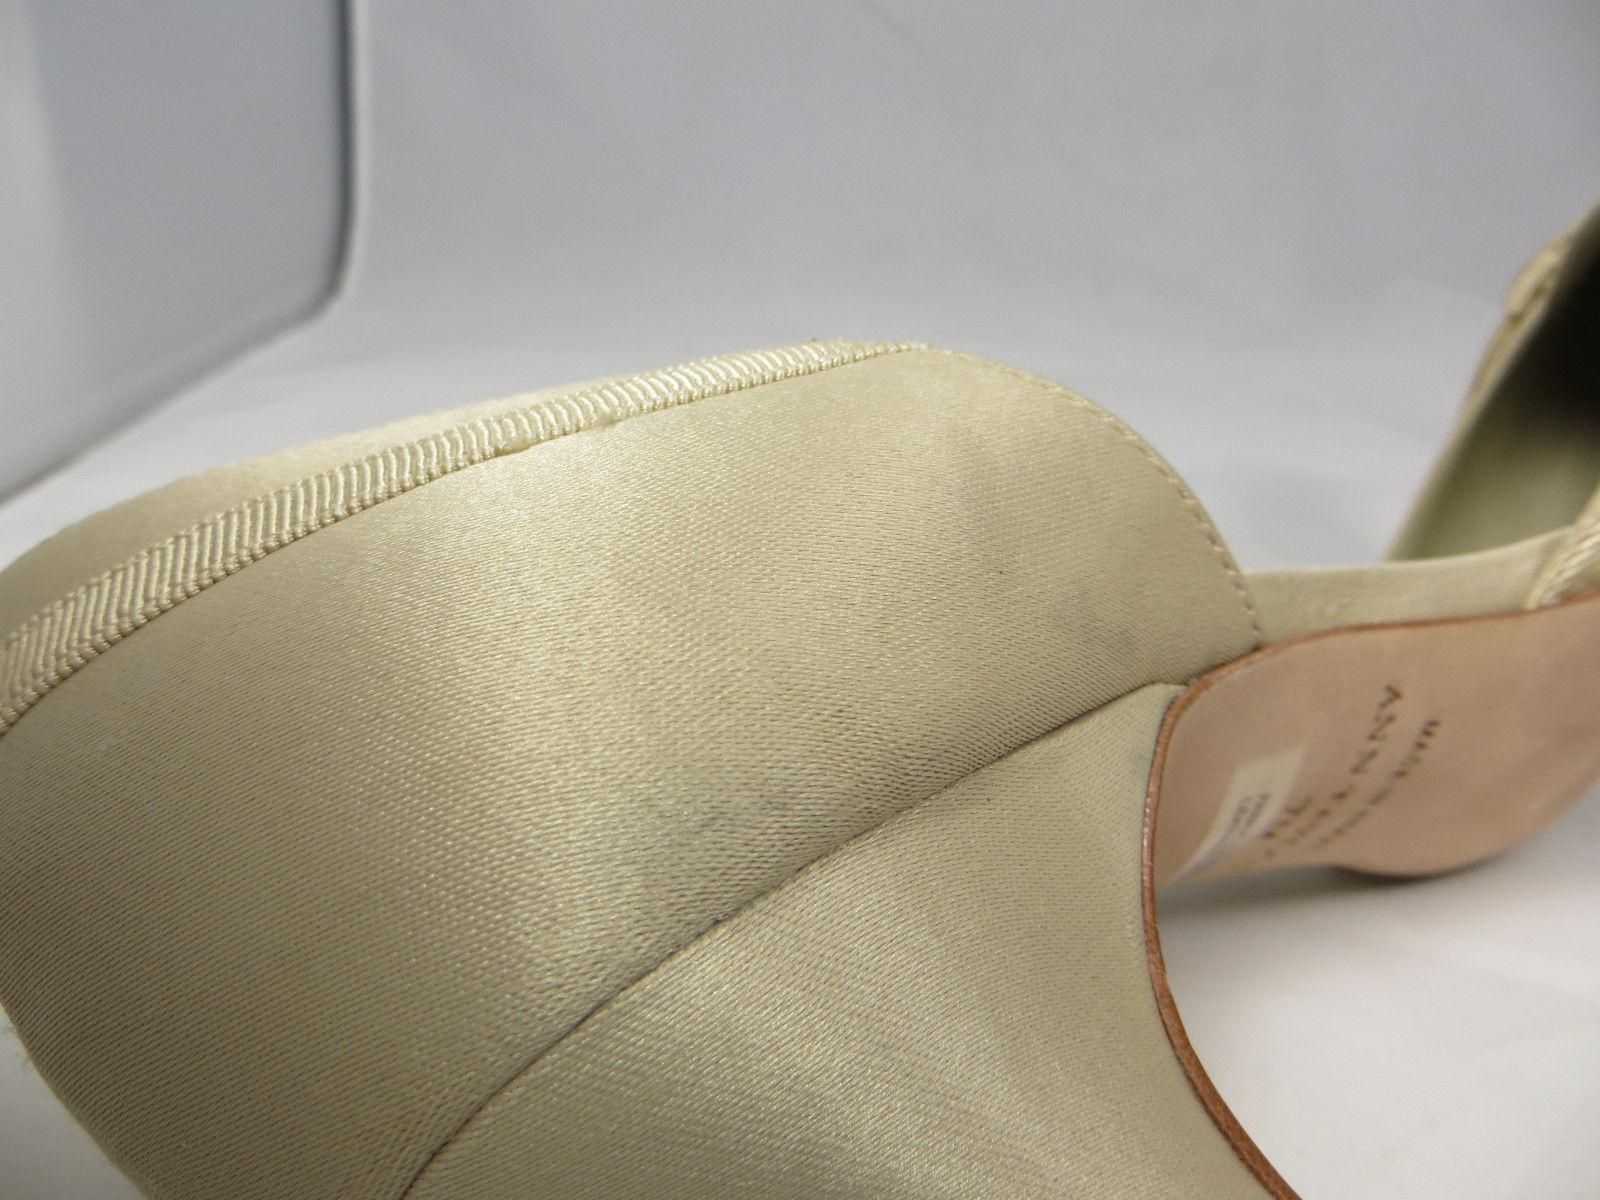 ANN TAYLOR Fabric Sateen Wedding Pumps Heels Beige Cream Leather Sole 7 M Brazil